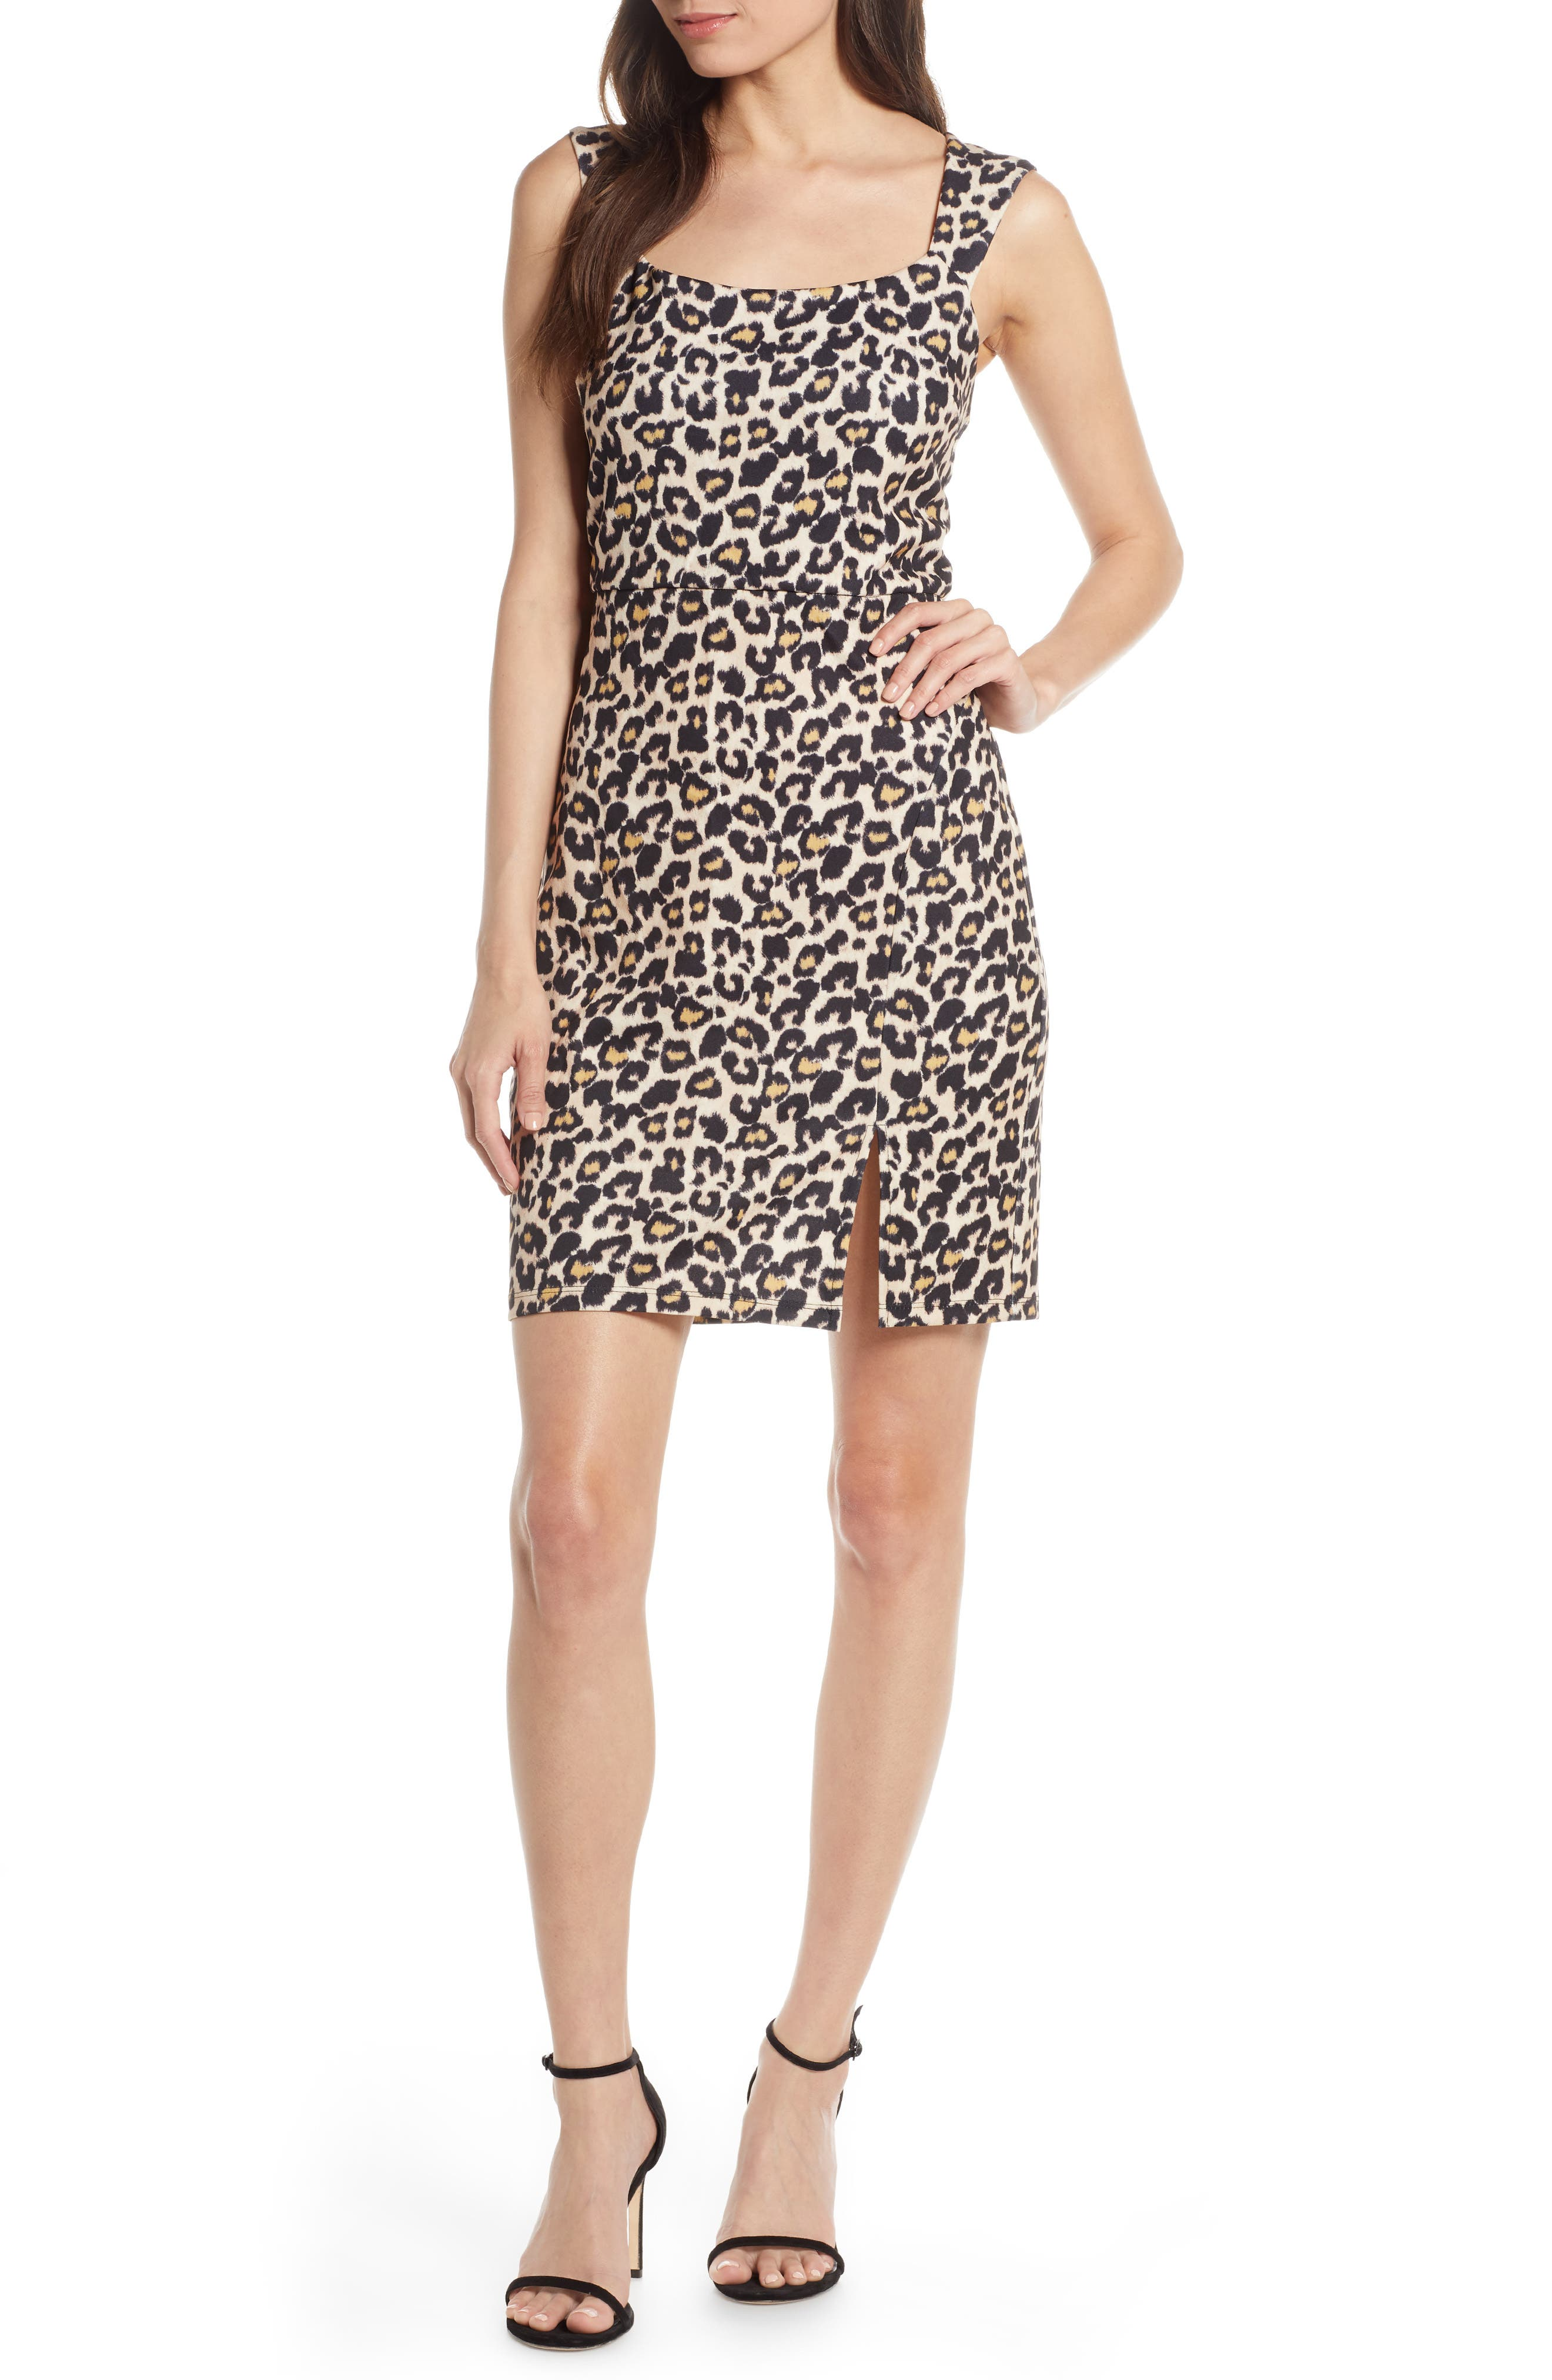 Sequin Hearts Animal Print Scuba Sheath Dress, Beige